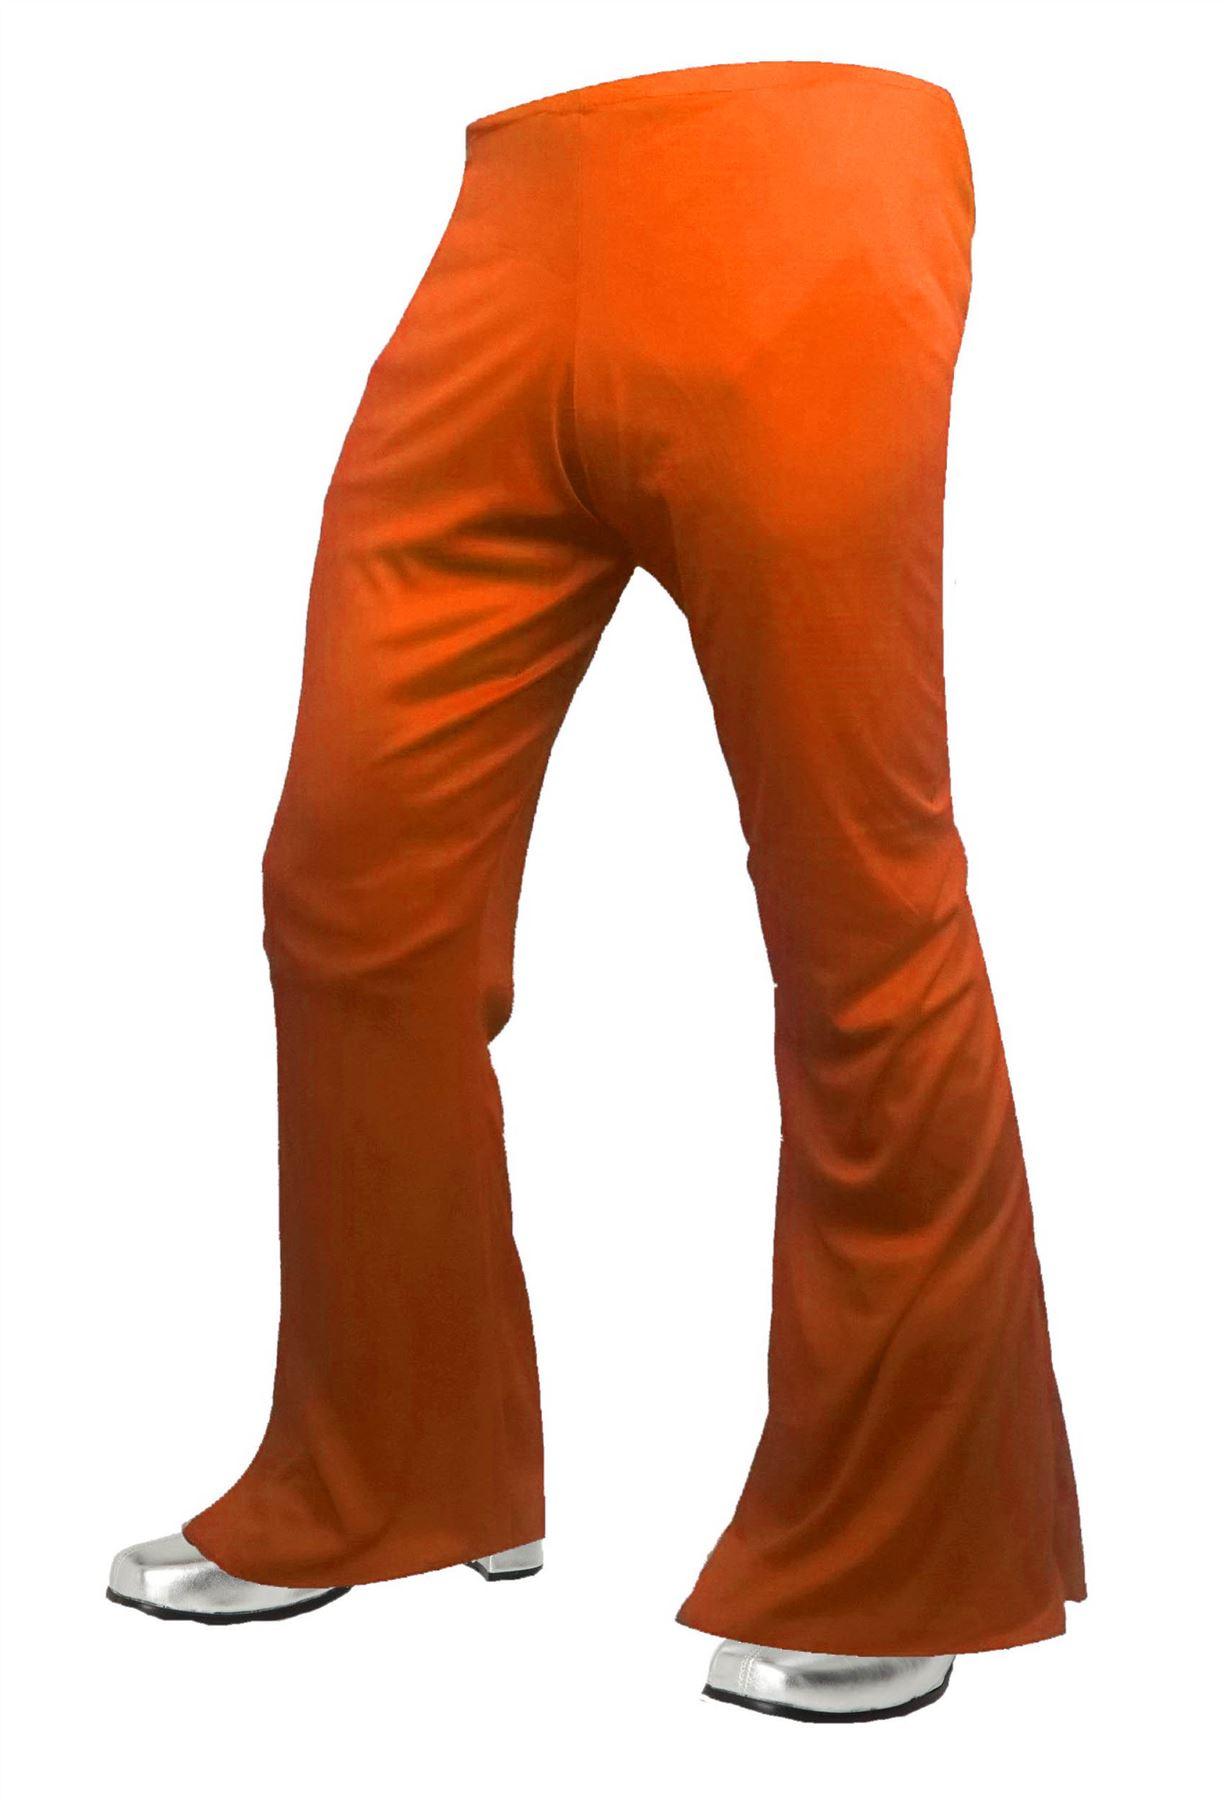 1970s Disco Stu Pants Hippy High Rise Bell Bottom Flares Fancy Dress